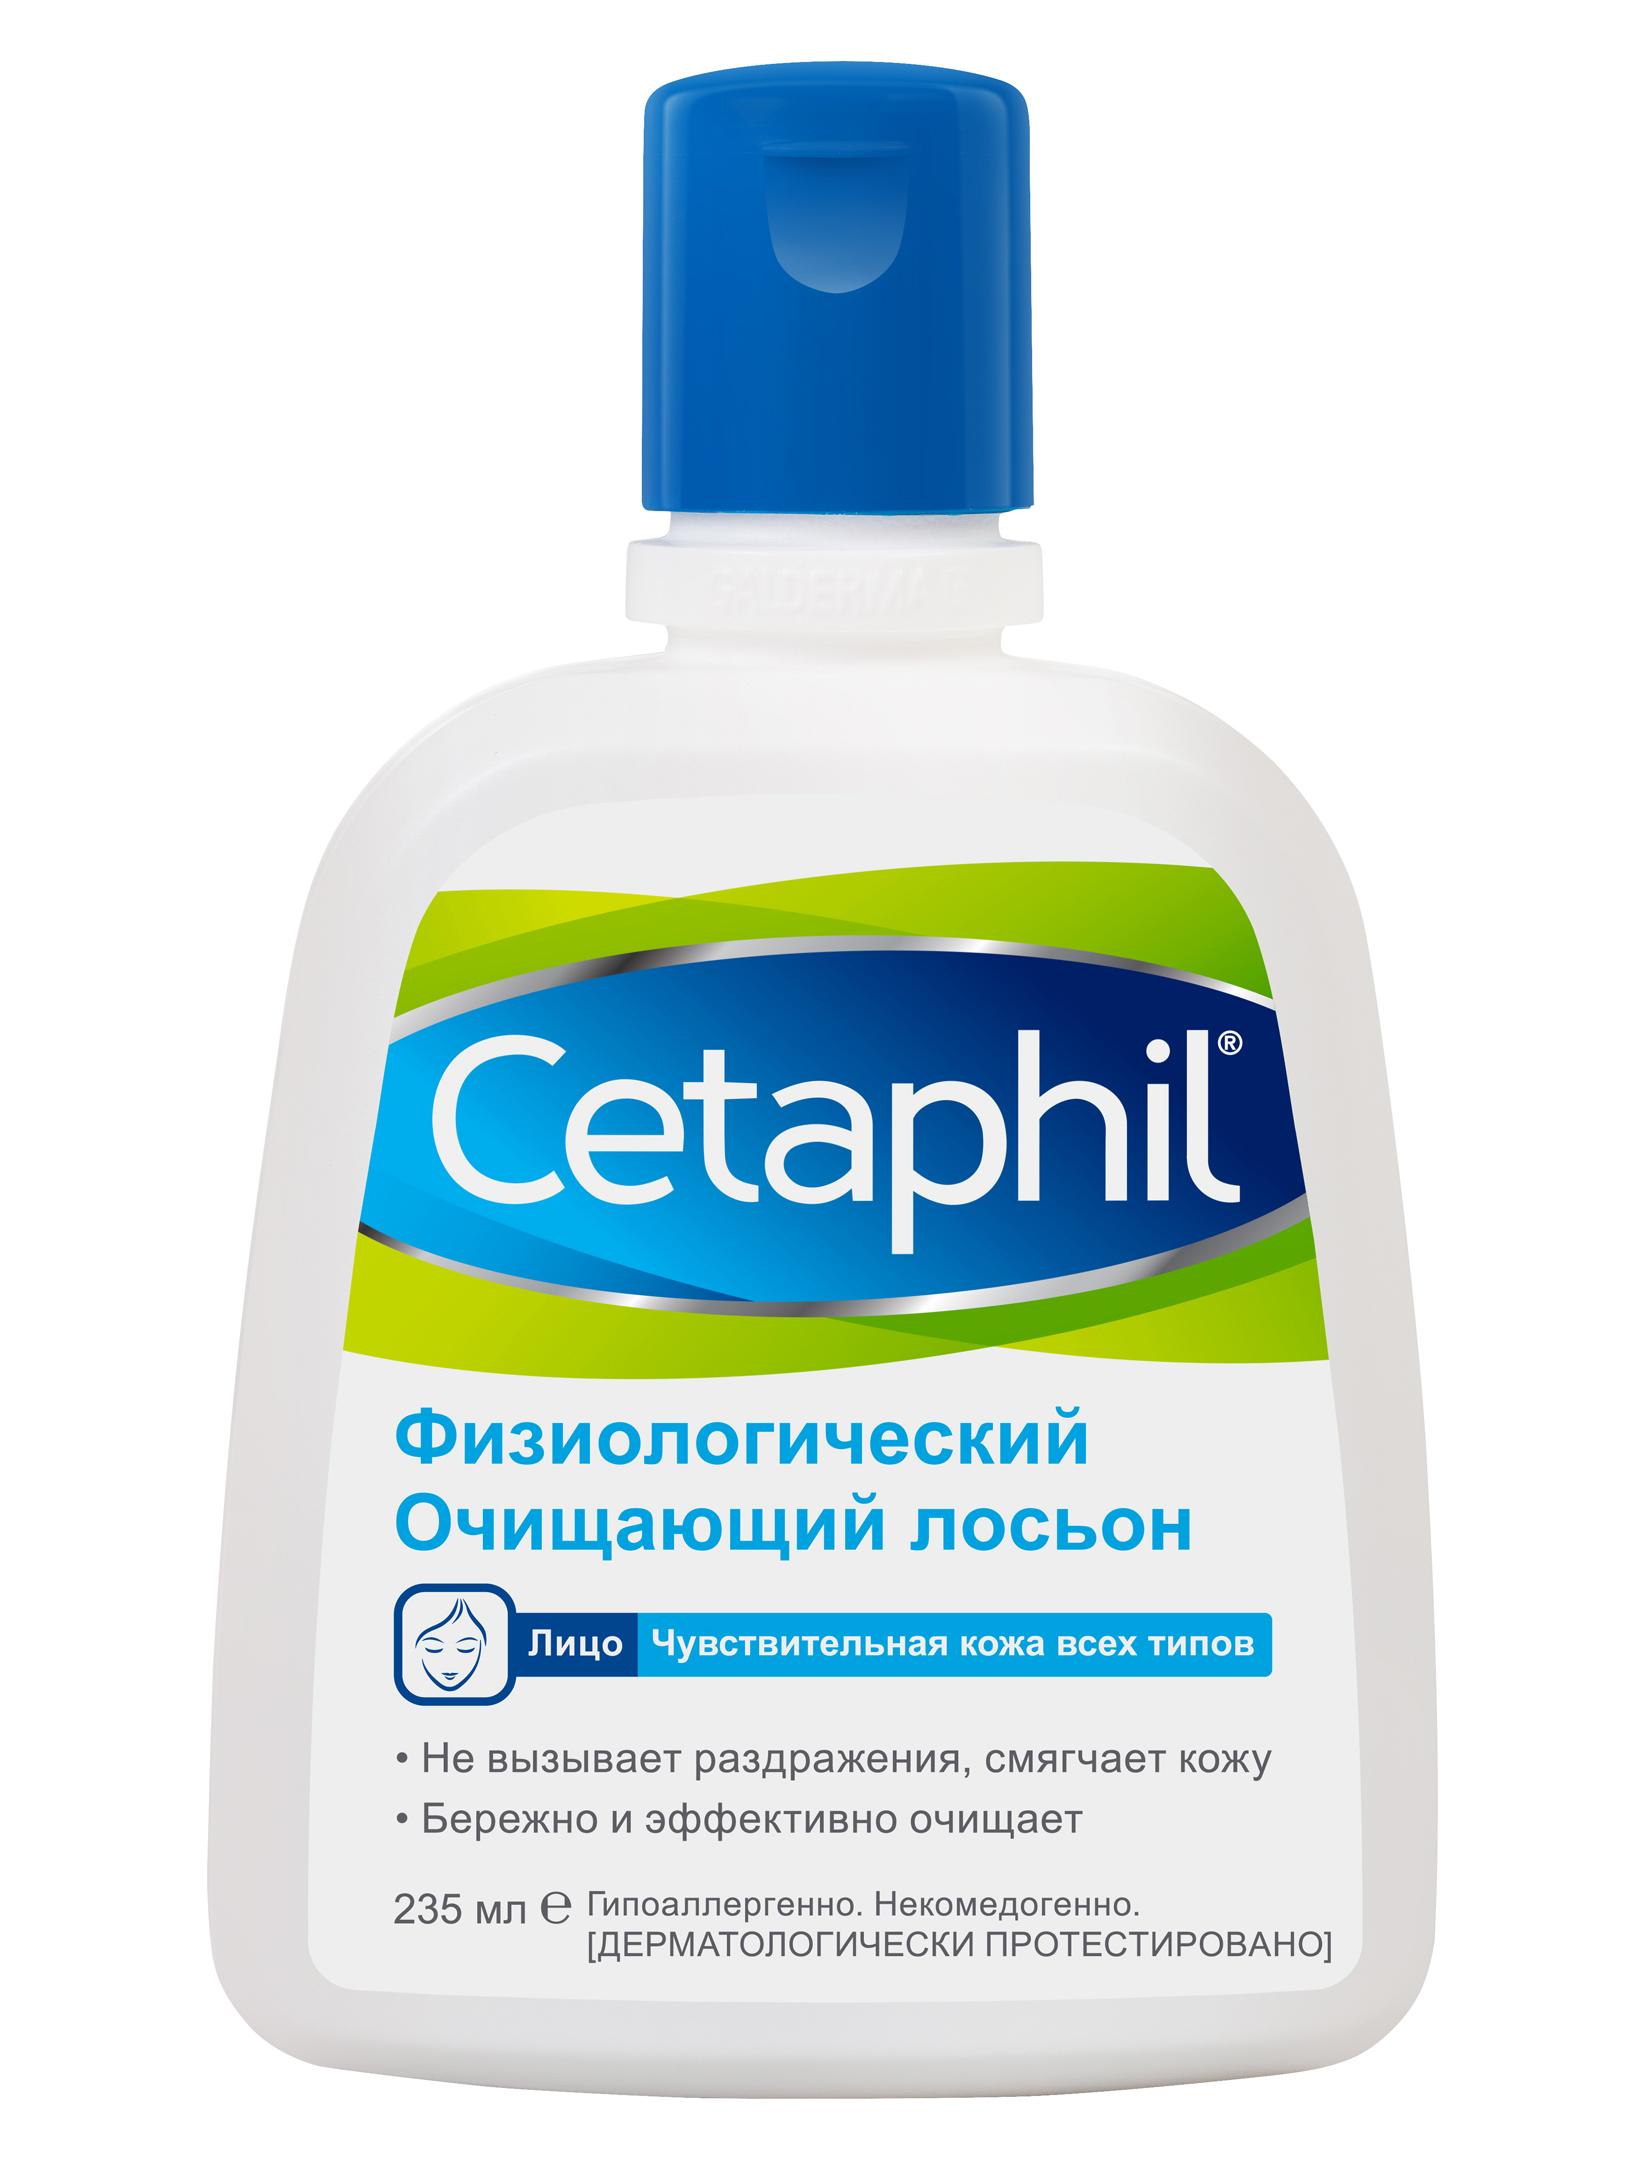 Cetaphil физиологический лосьон очищающий 235мл